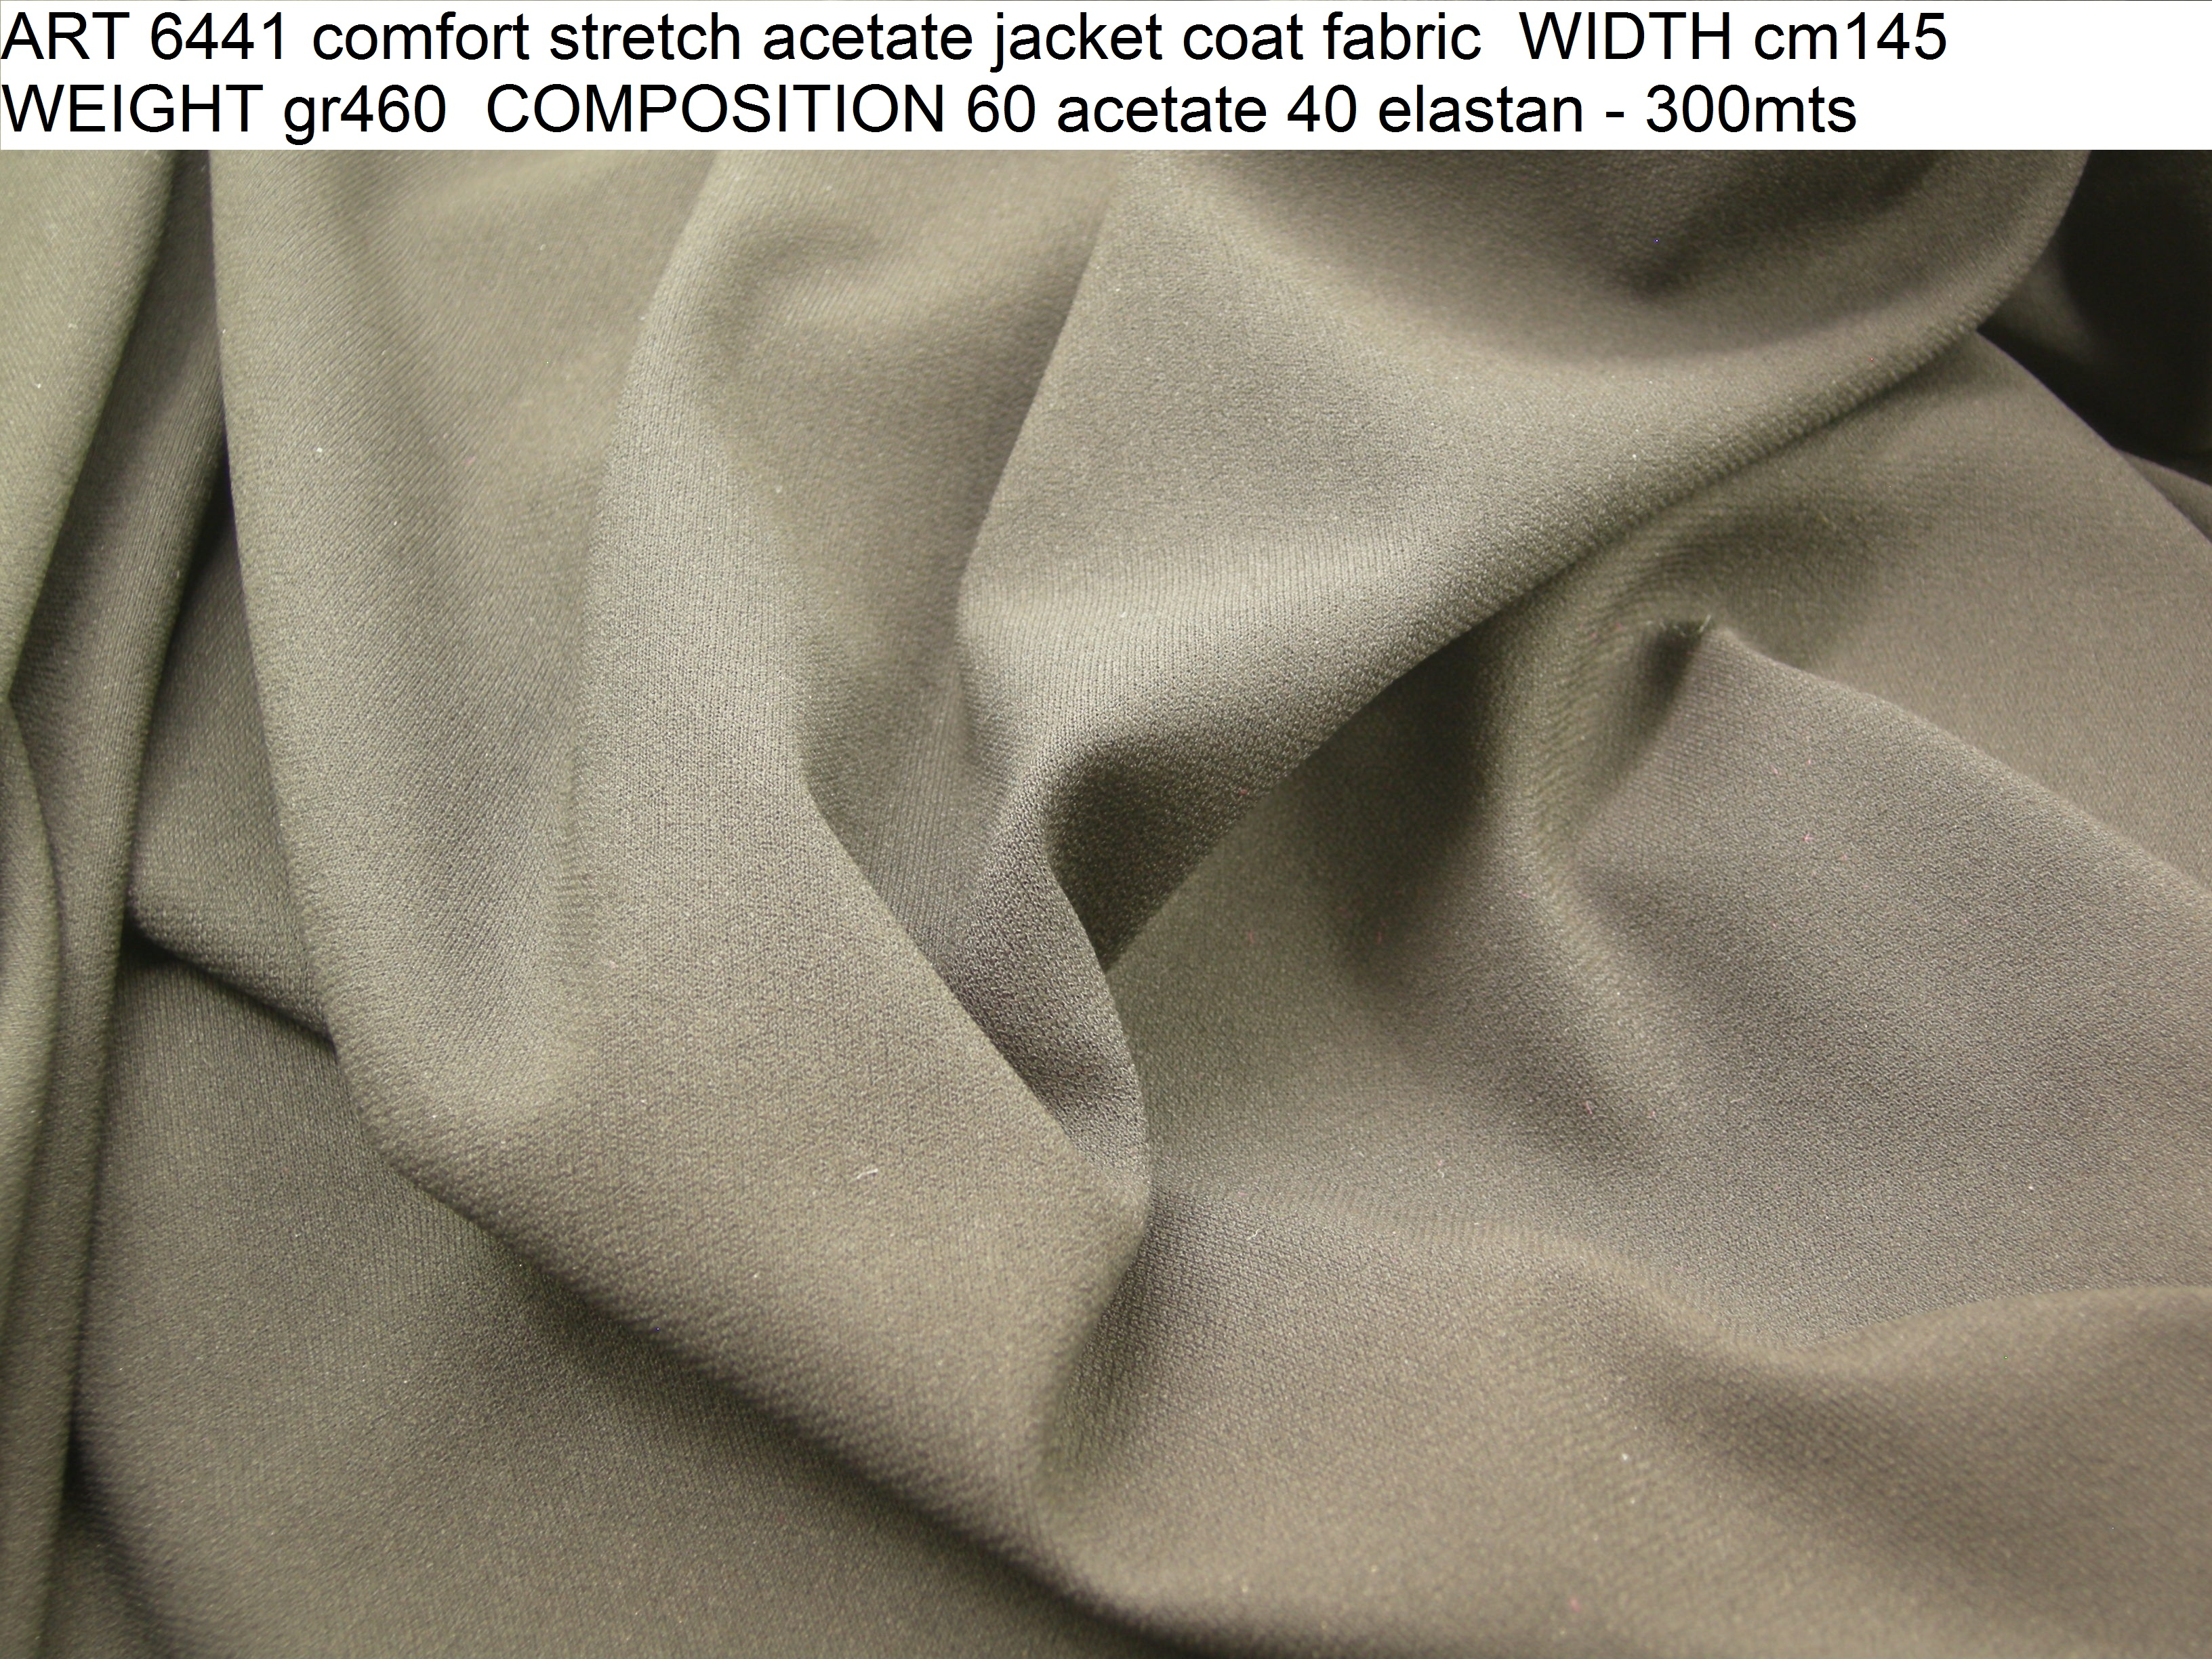 ART 6441 comfort stretch acetate jacket coat fabric WIDTH cm145 WEIGHT gr460 COMPOSITION 60 acetate 40 elastan - 300mts